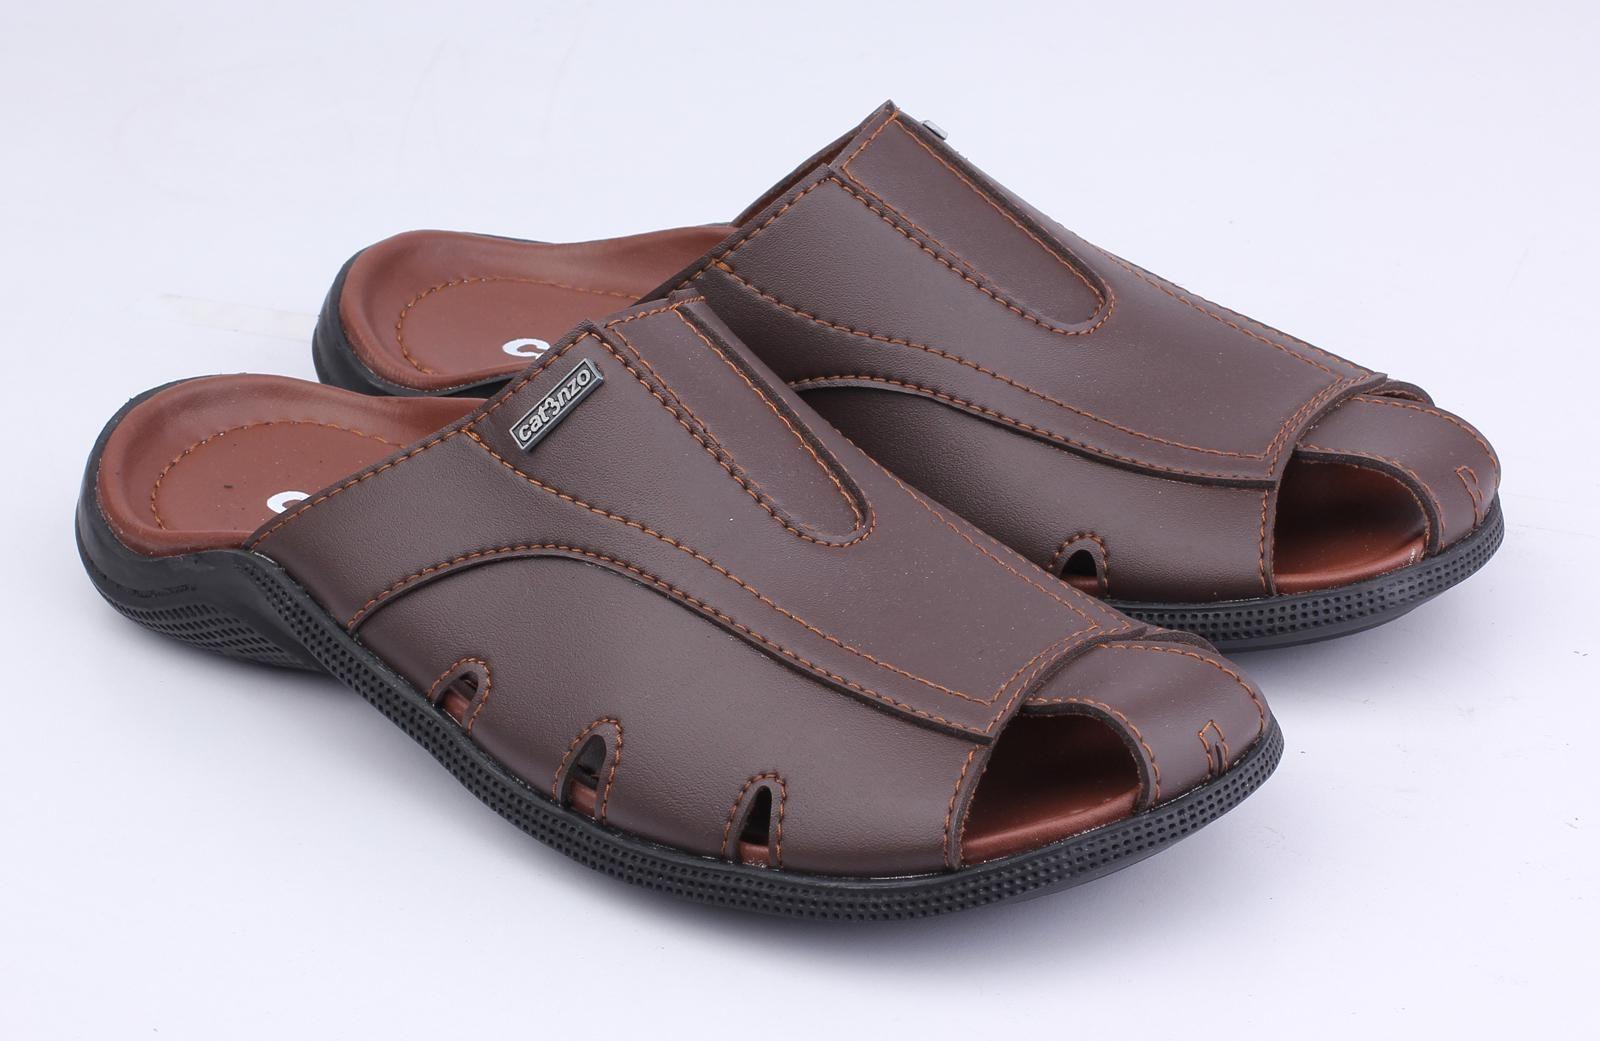 Sepatu Sandal Pria Cs 921 Sandal Pria Sepatu Sandal